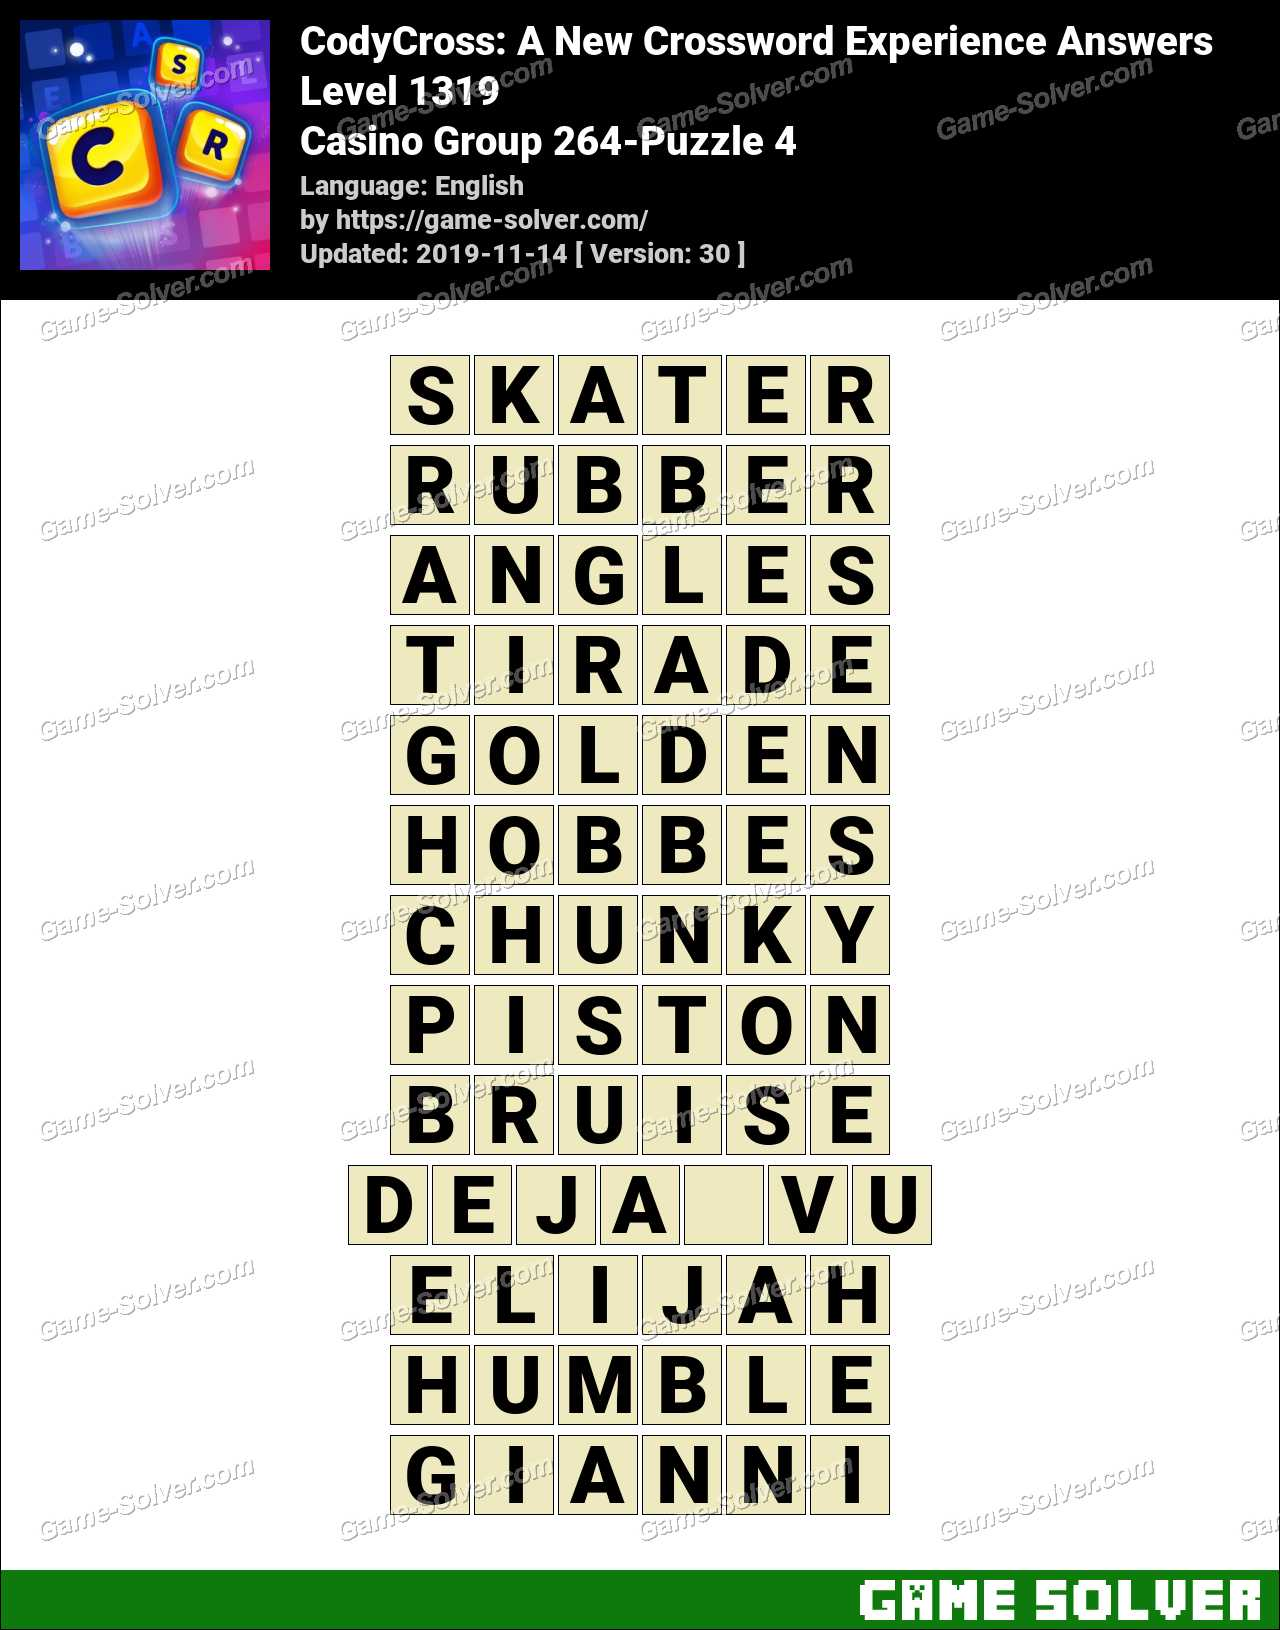 CodyCross Casino Group 264-Puzzle 4 Answers